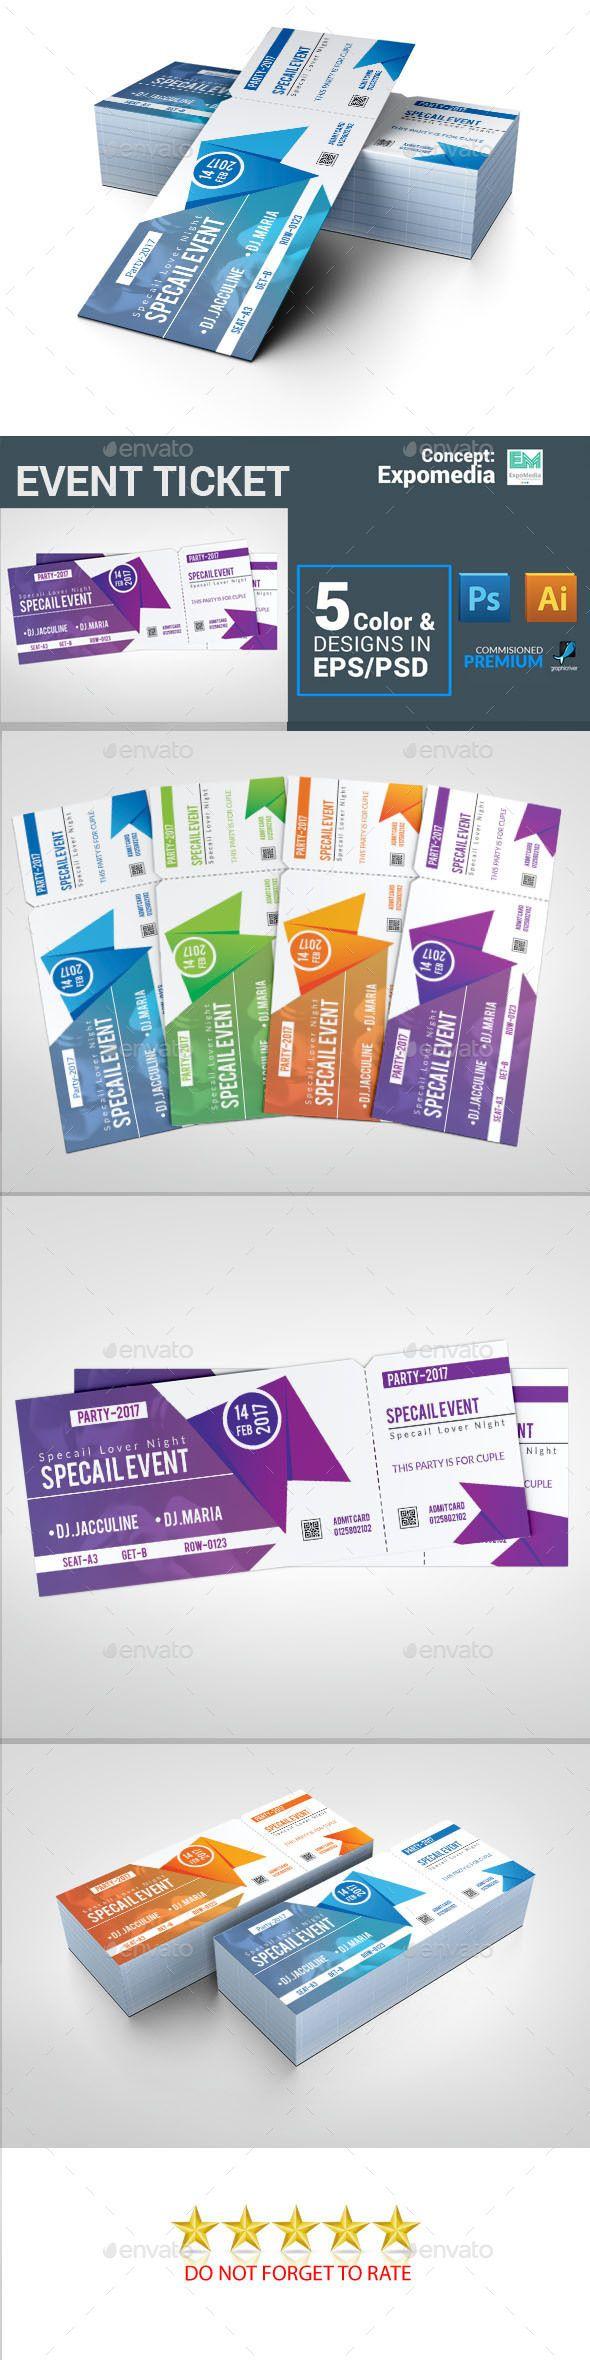 25 best Ticket Templates images on Pinterest   Font logo, Print ...